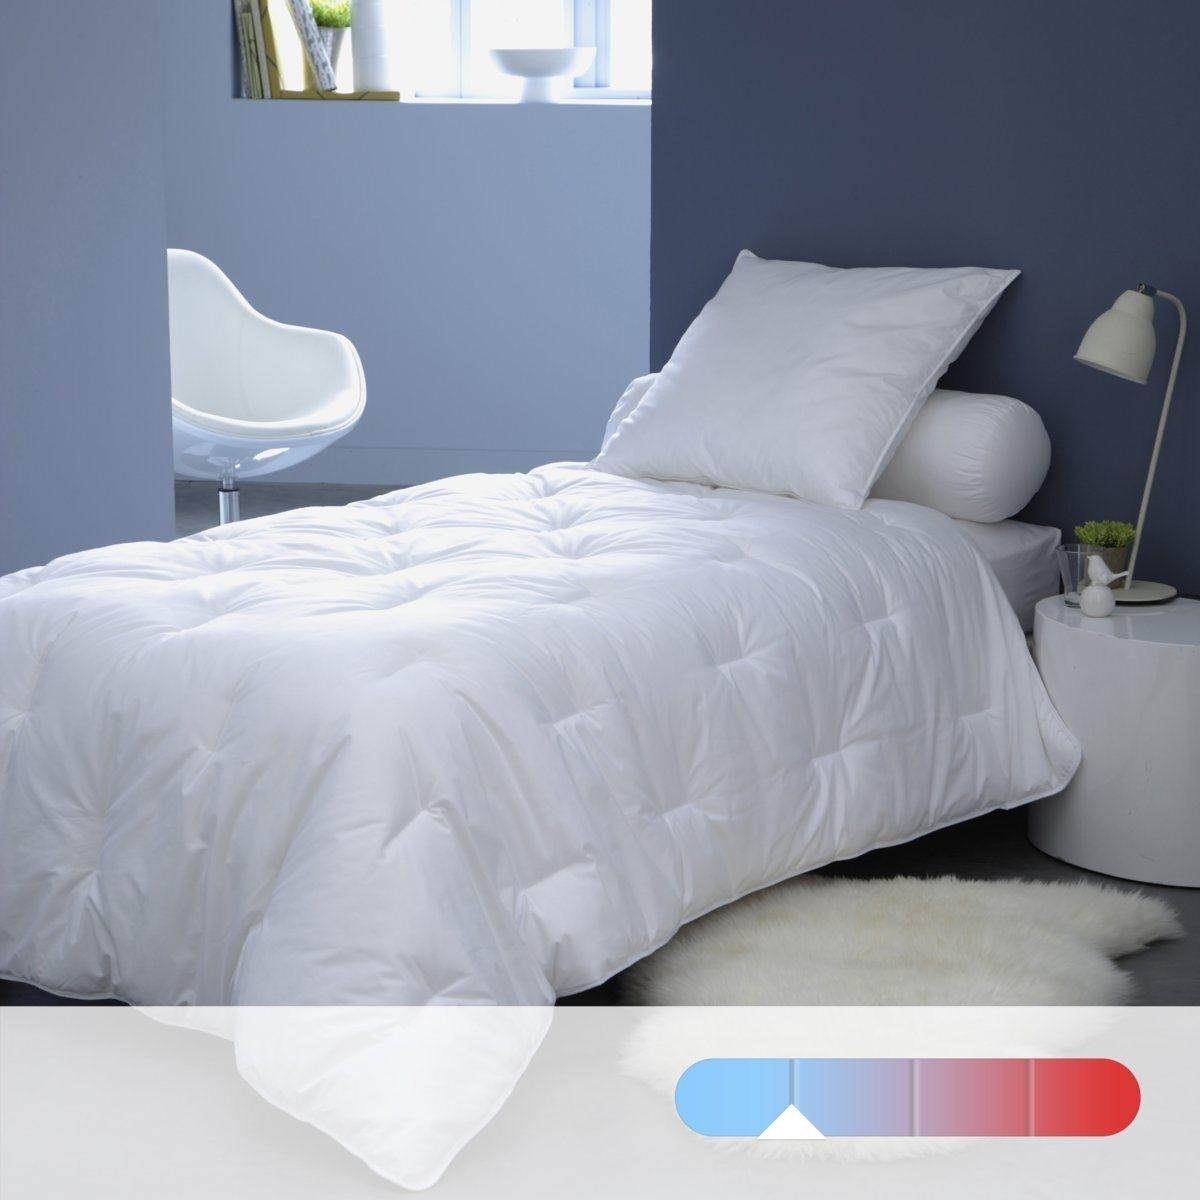 Одеяло синтетическое 175г/м² Quallofil Allerban